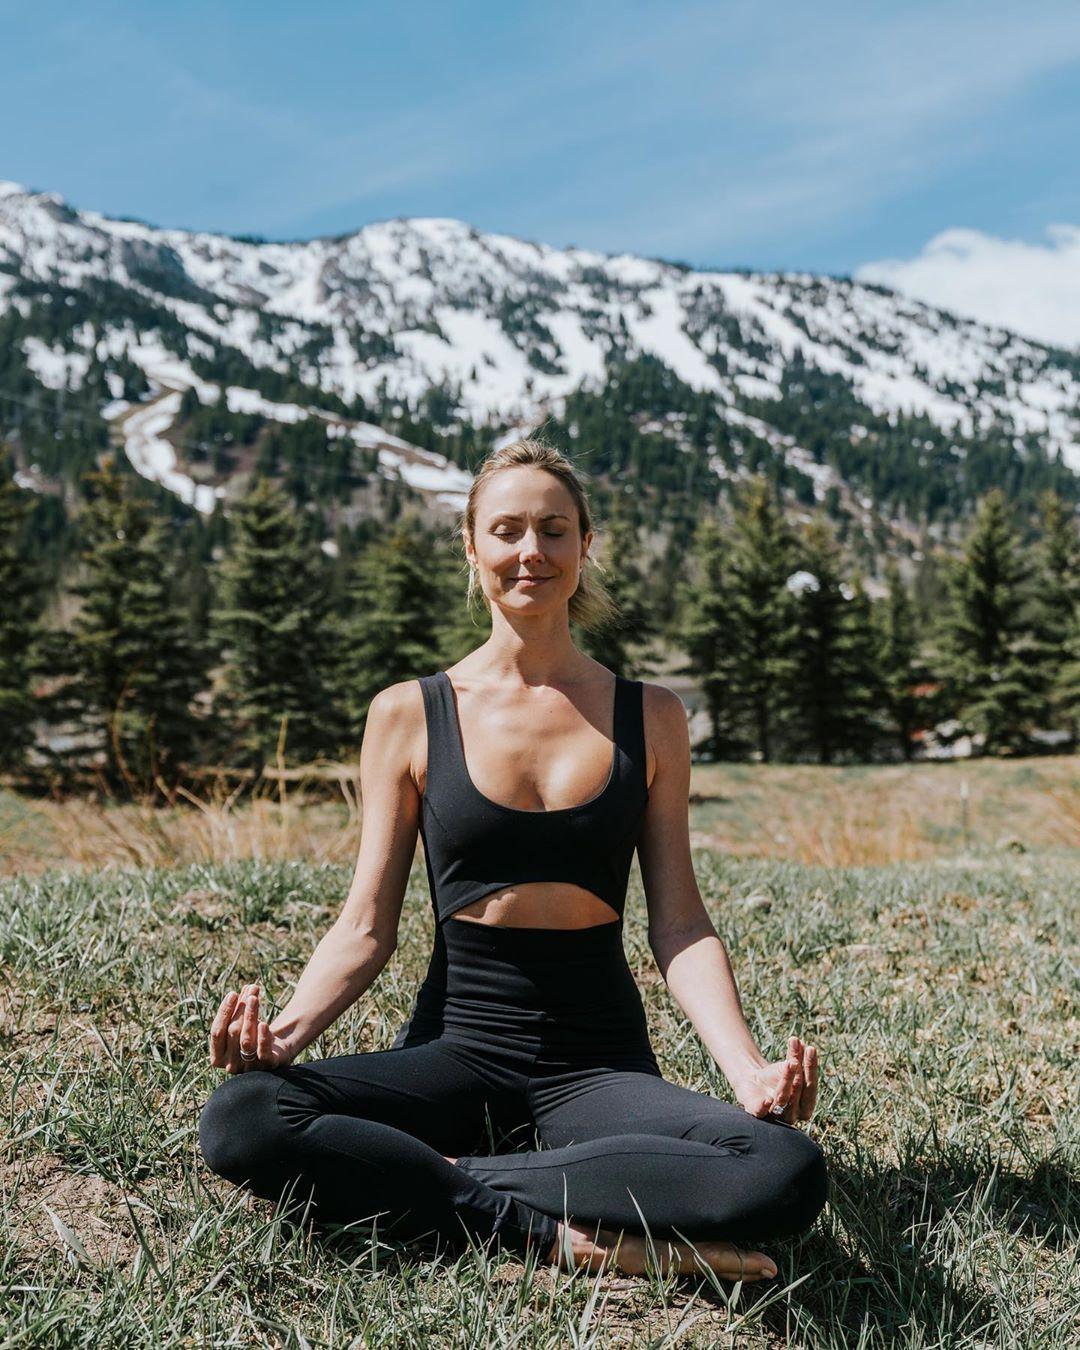 Stacy Keibler 2019 : Stacy Keibler – Social Media Thread-11